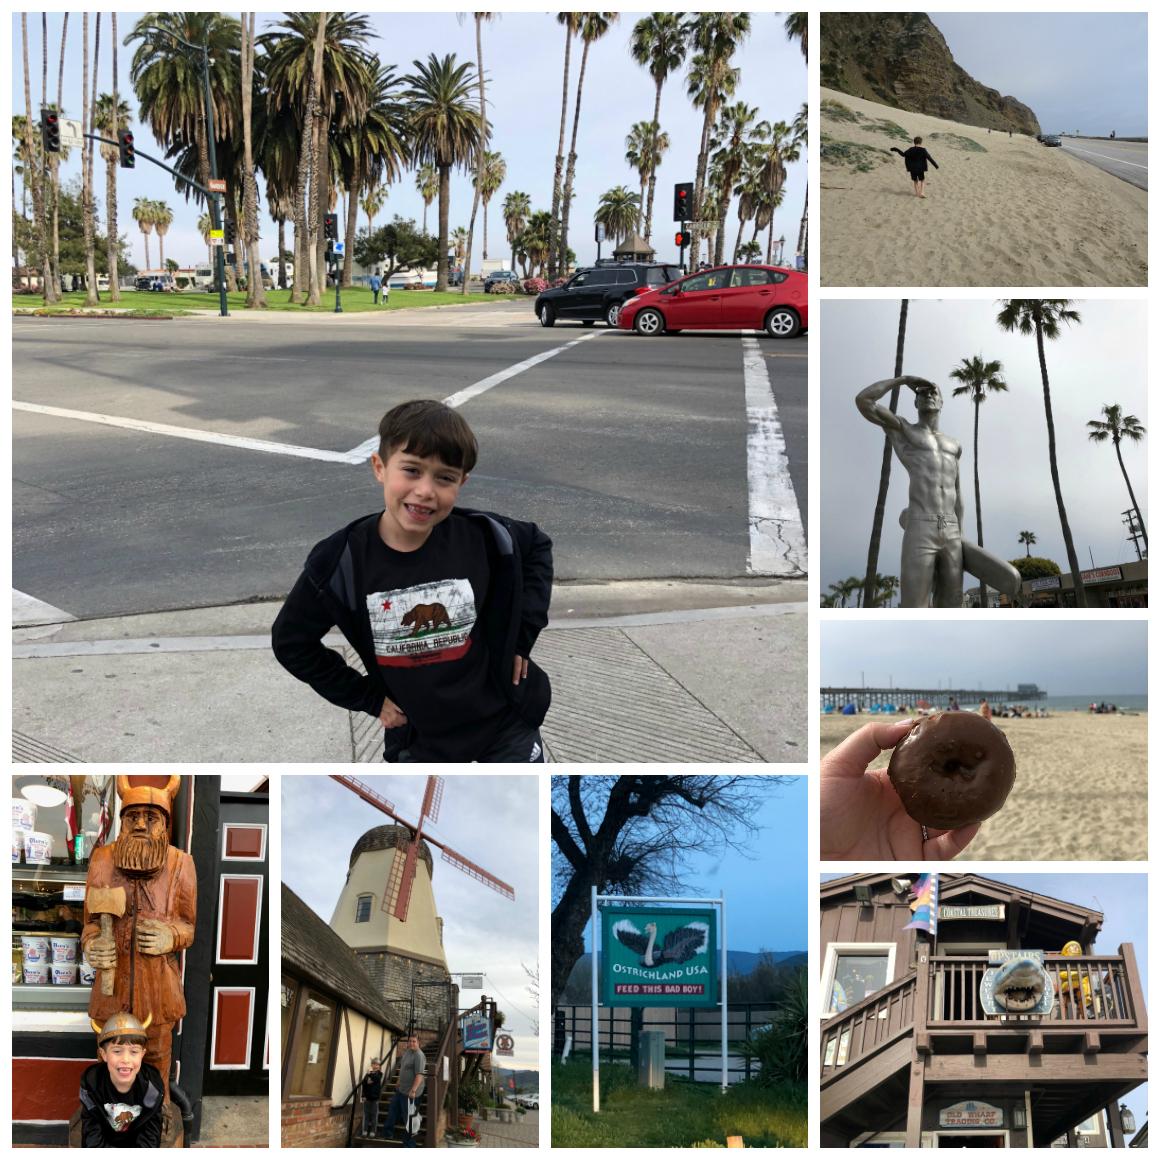 California Road Trip To Newport Beach Santa Barbara And Solvang With Kids